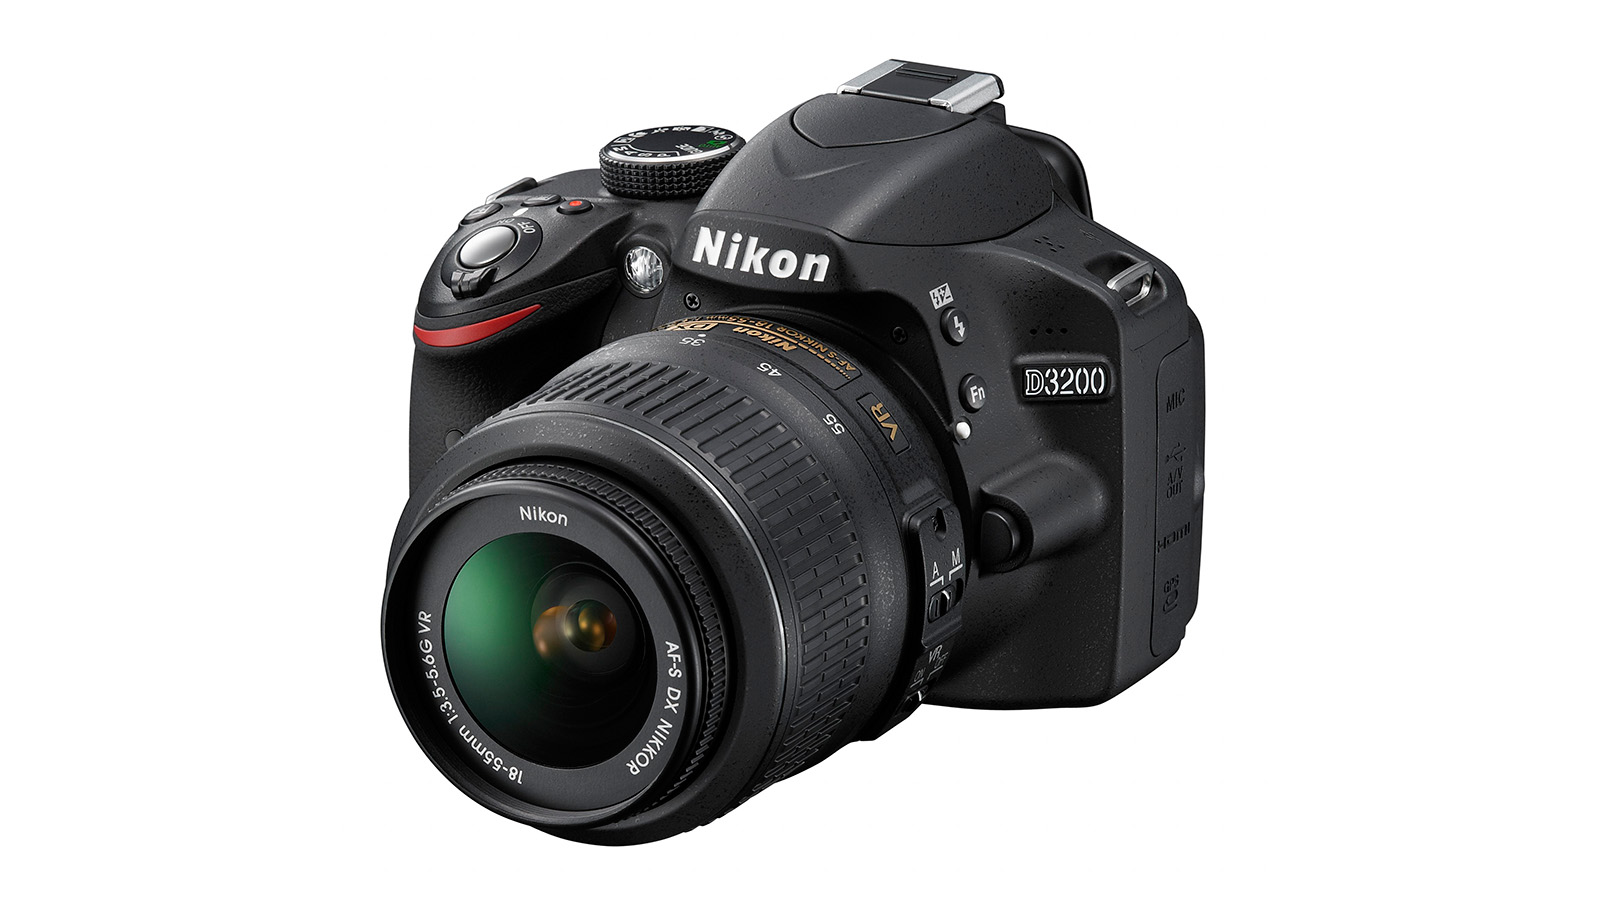 Nikon Announces the D3200 Digital SLR Camera